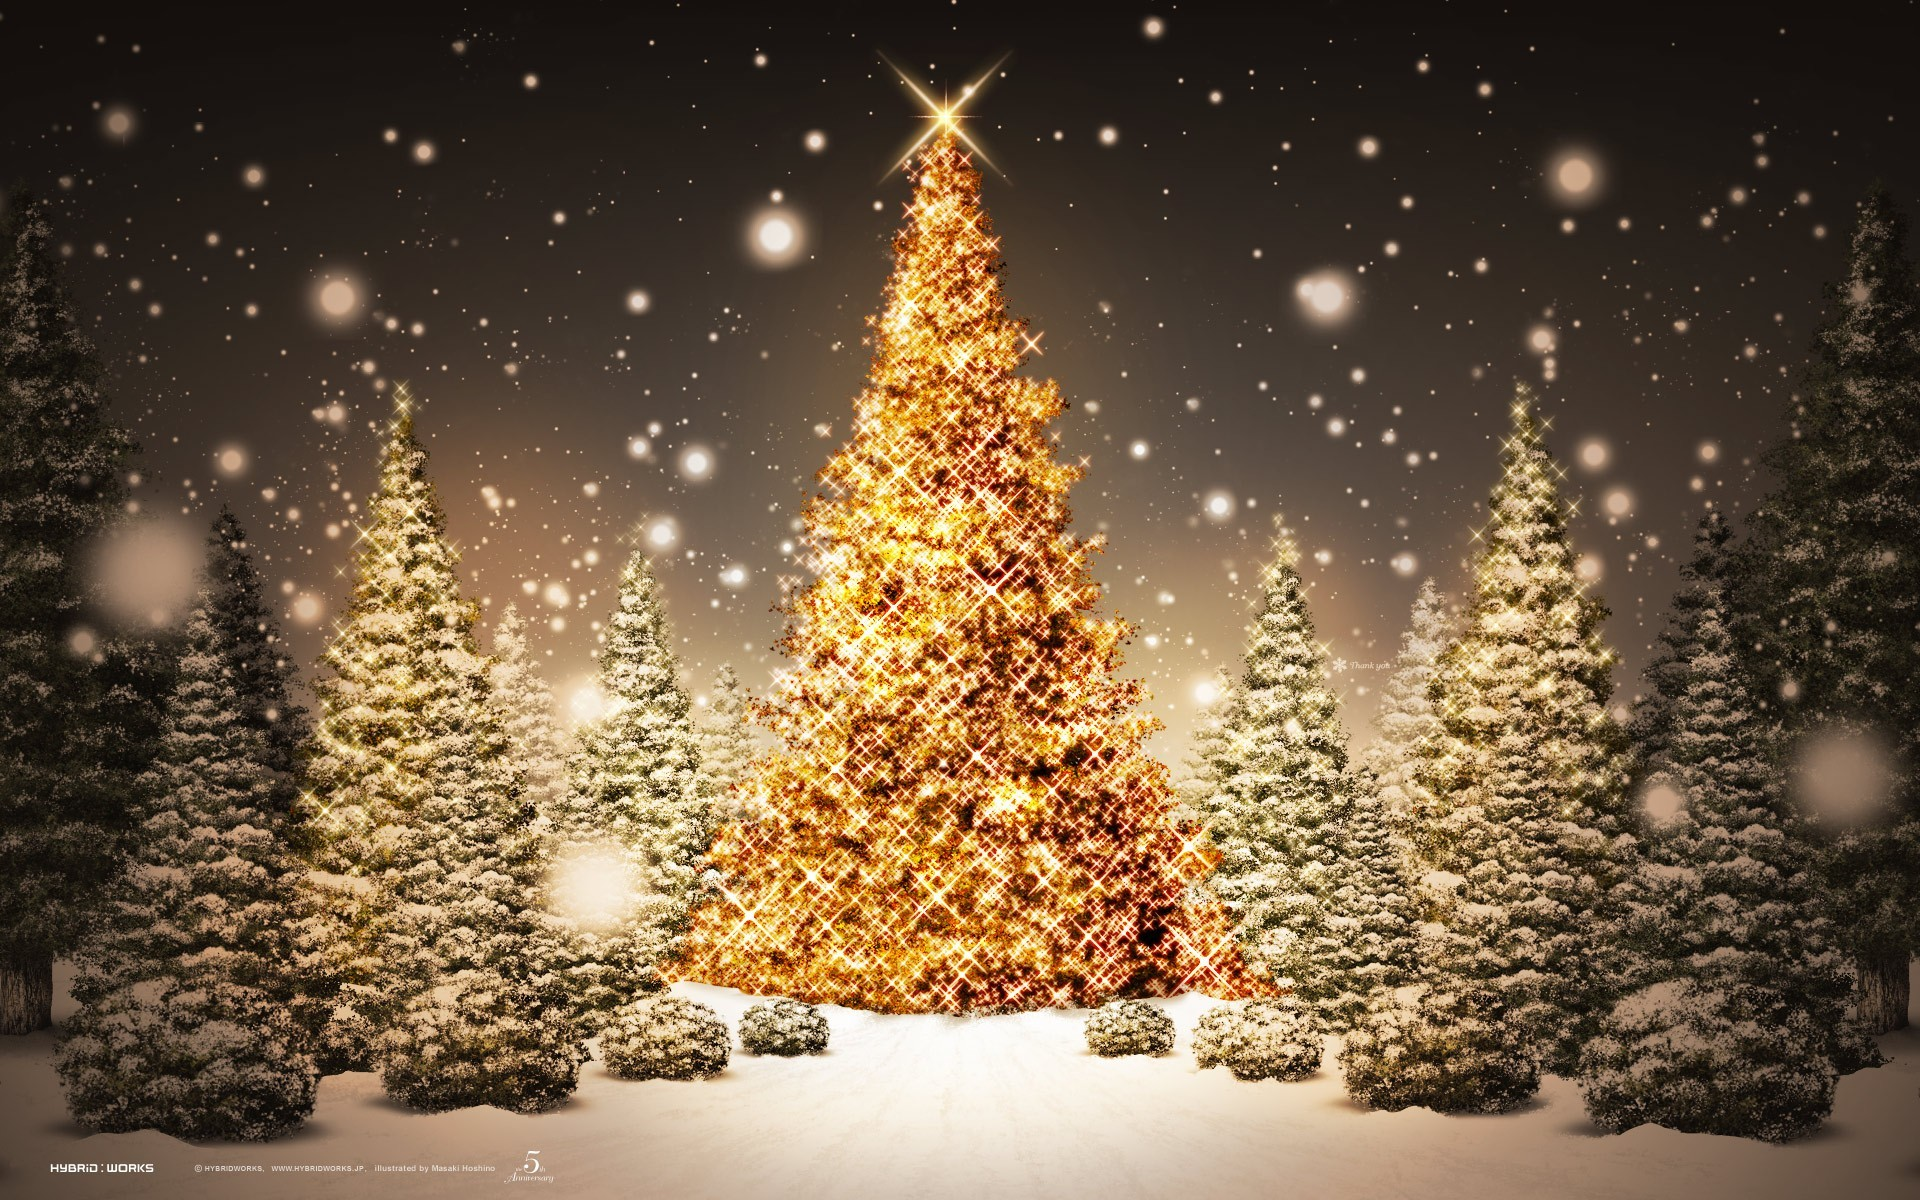 2015 Christmas desktop background